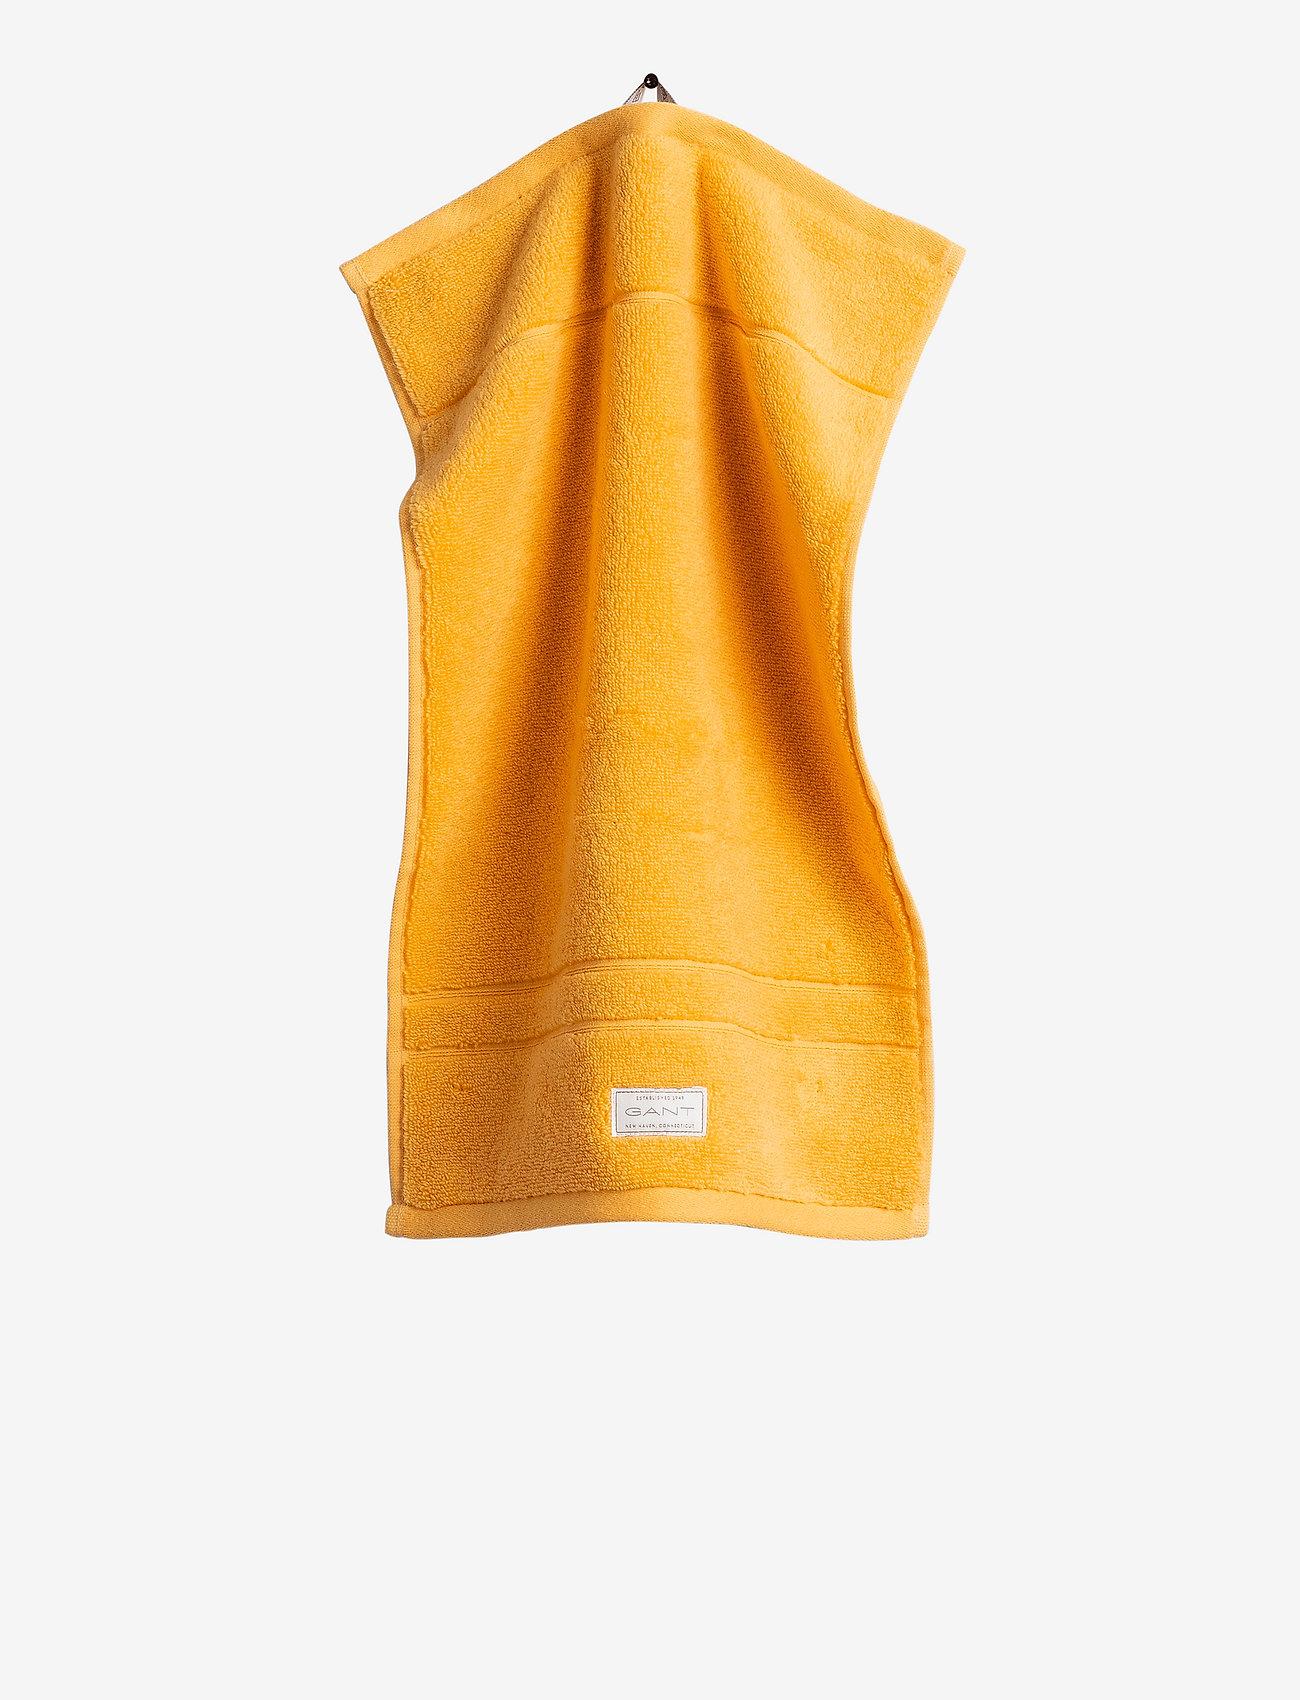 GANT - PREMIUM TOWEL 30X50 - hand towels & bath towels - mandarin orange - 0